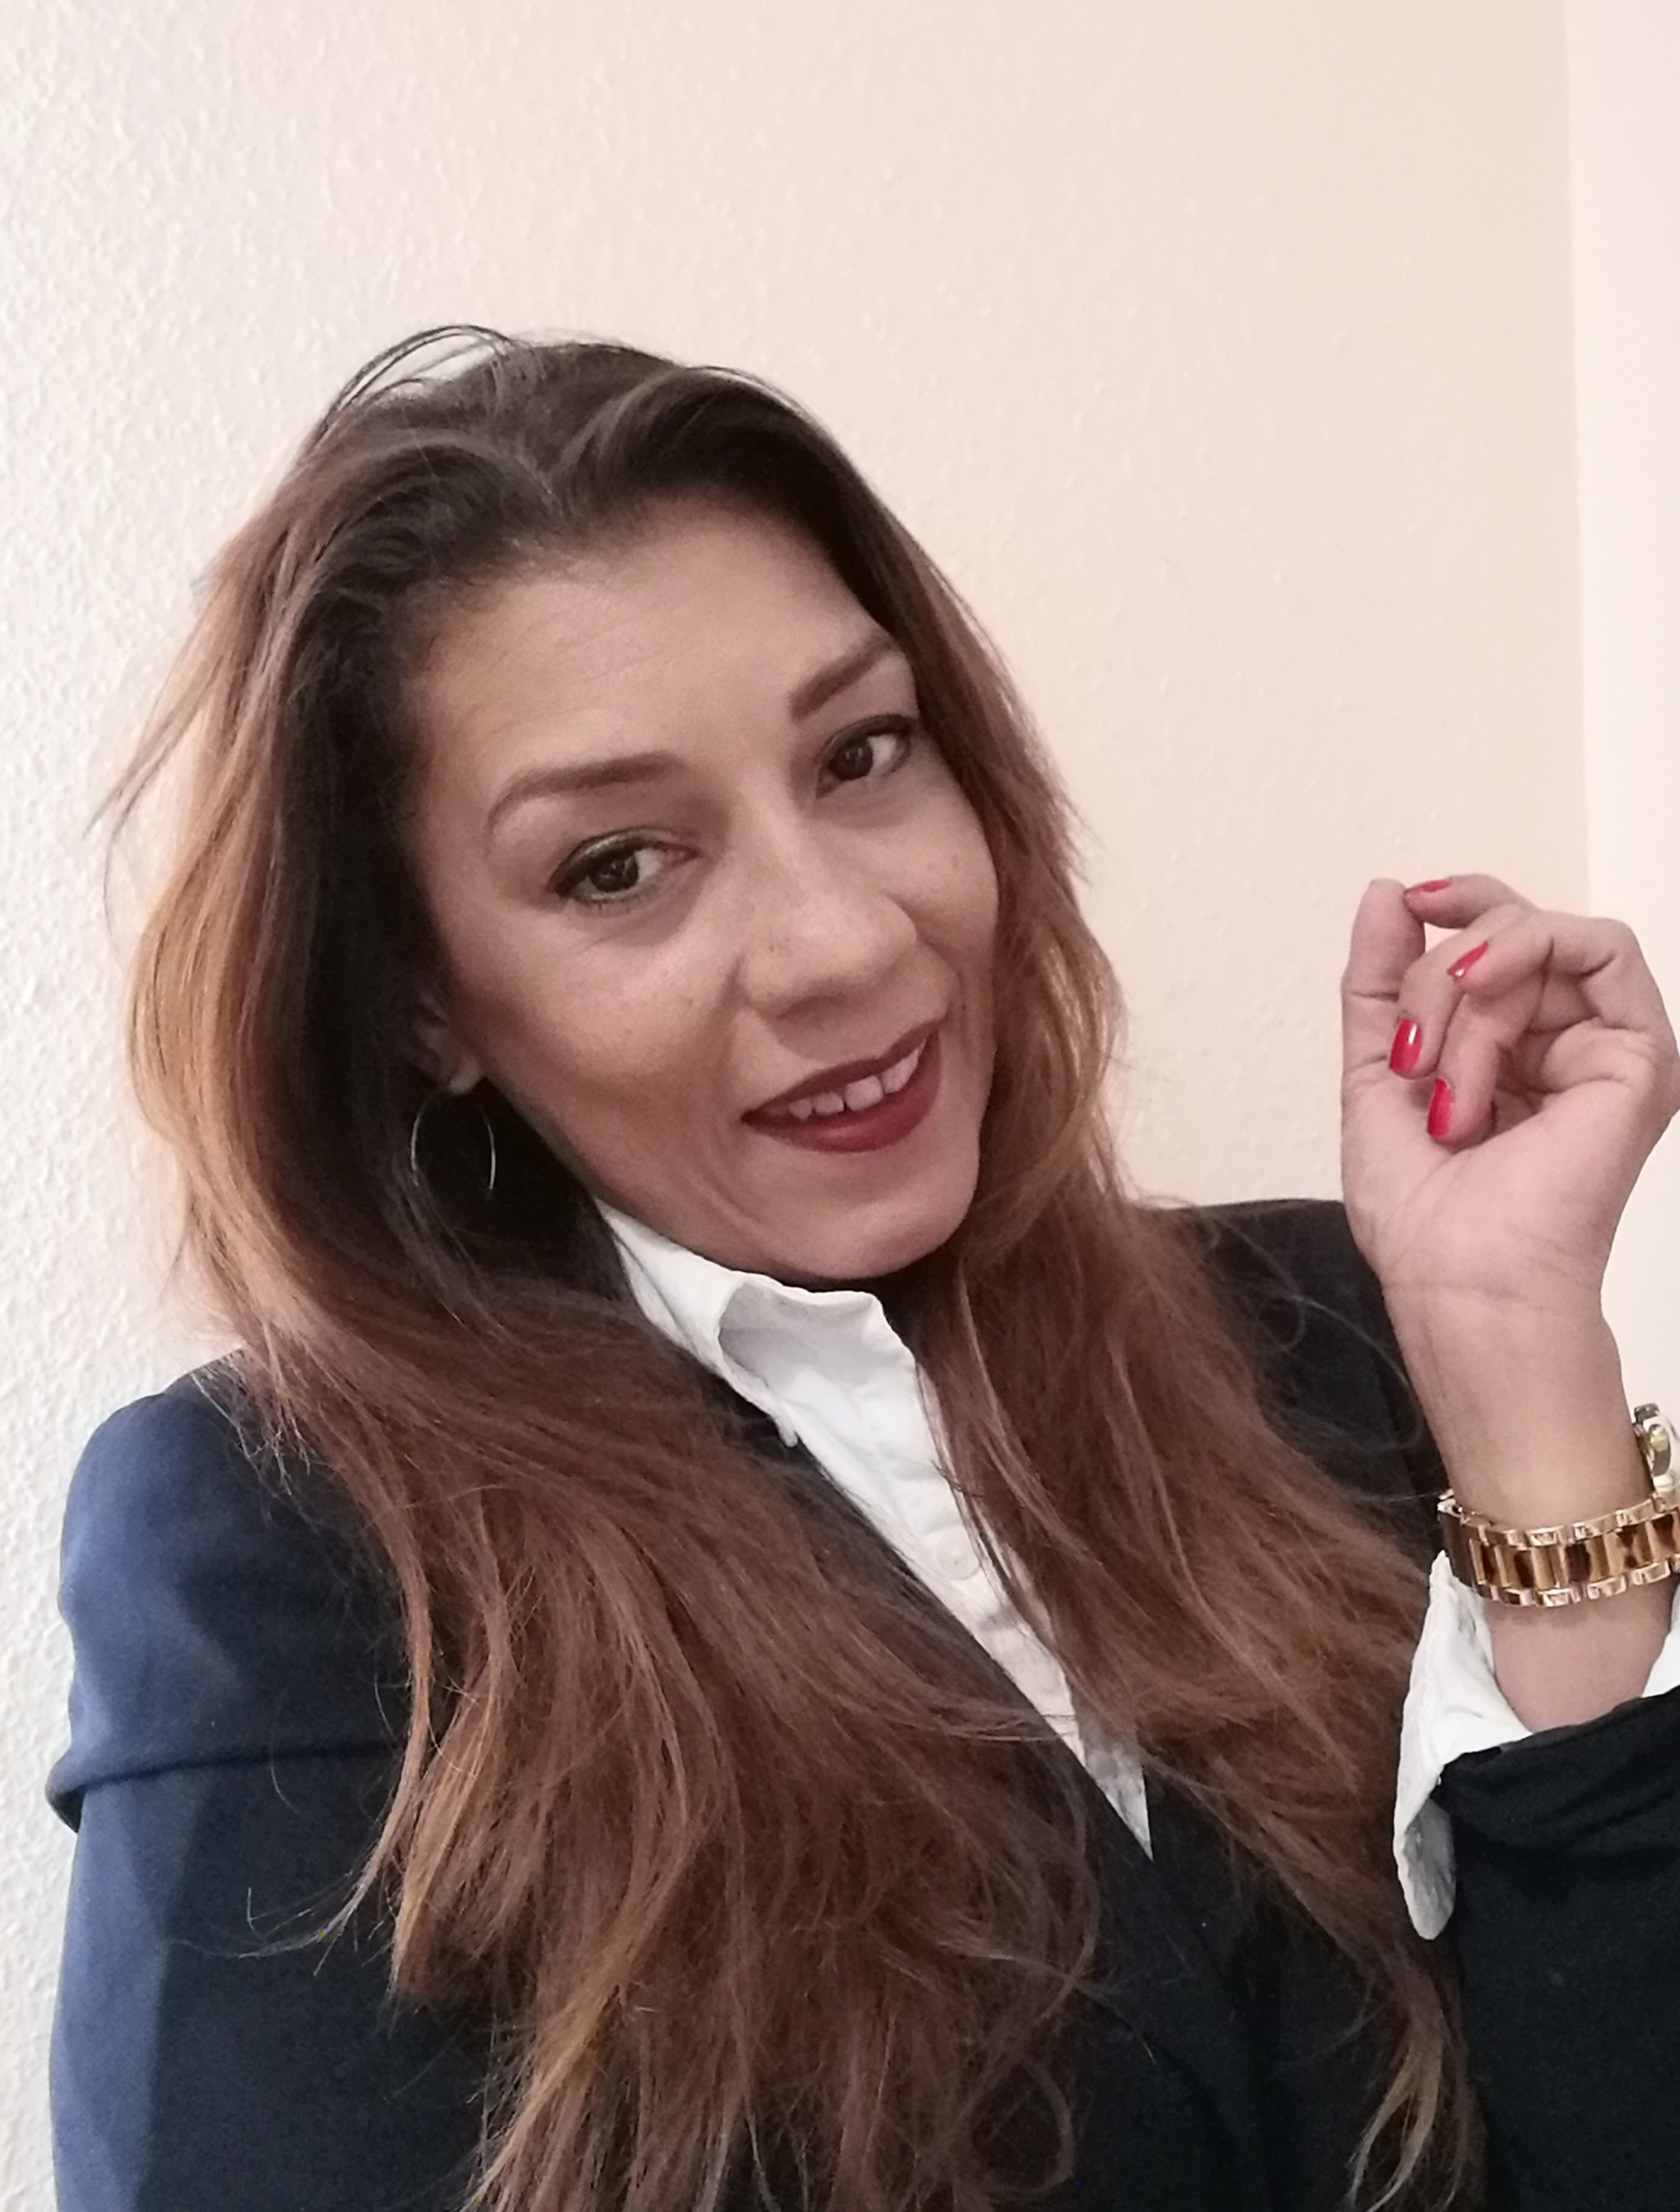 Glorinell Ariana Yegres Figueroa